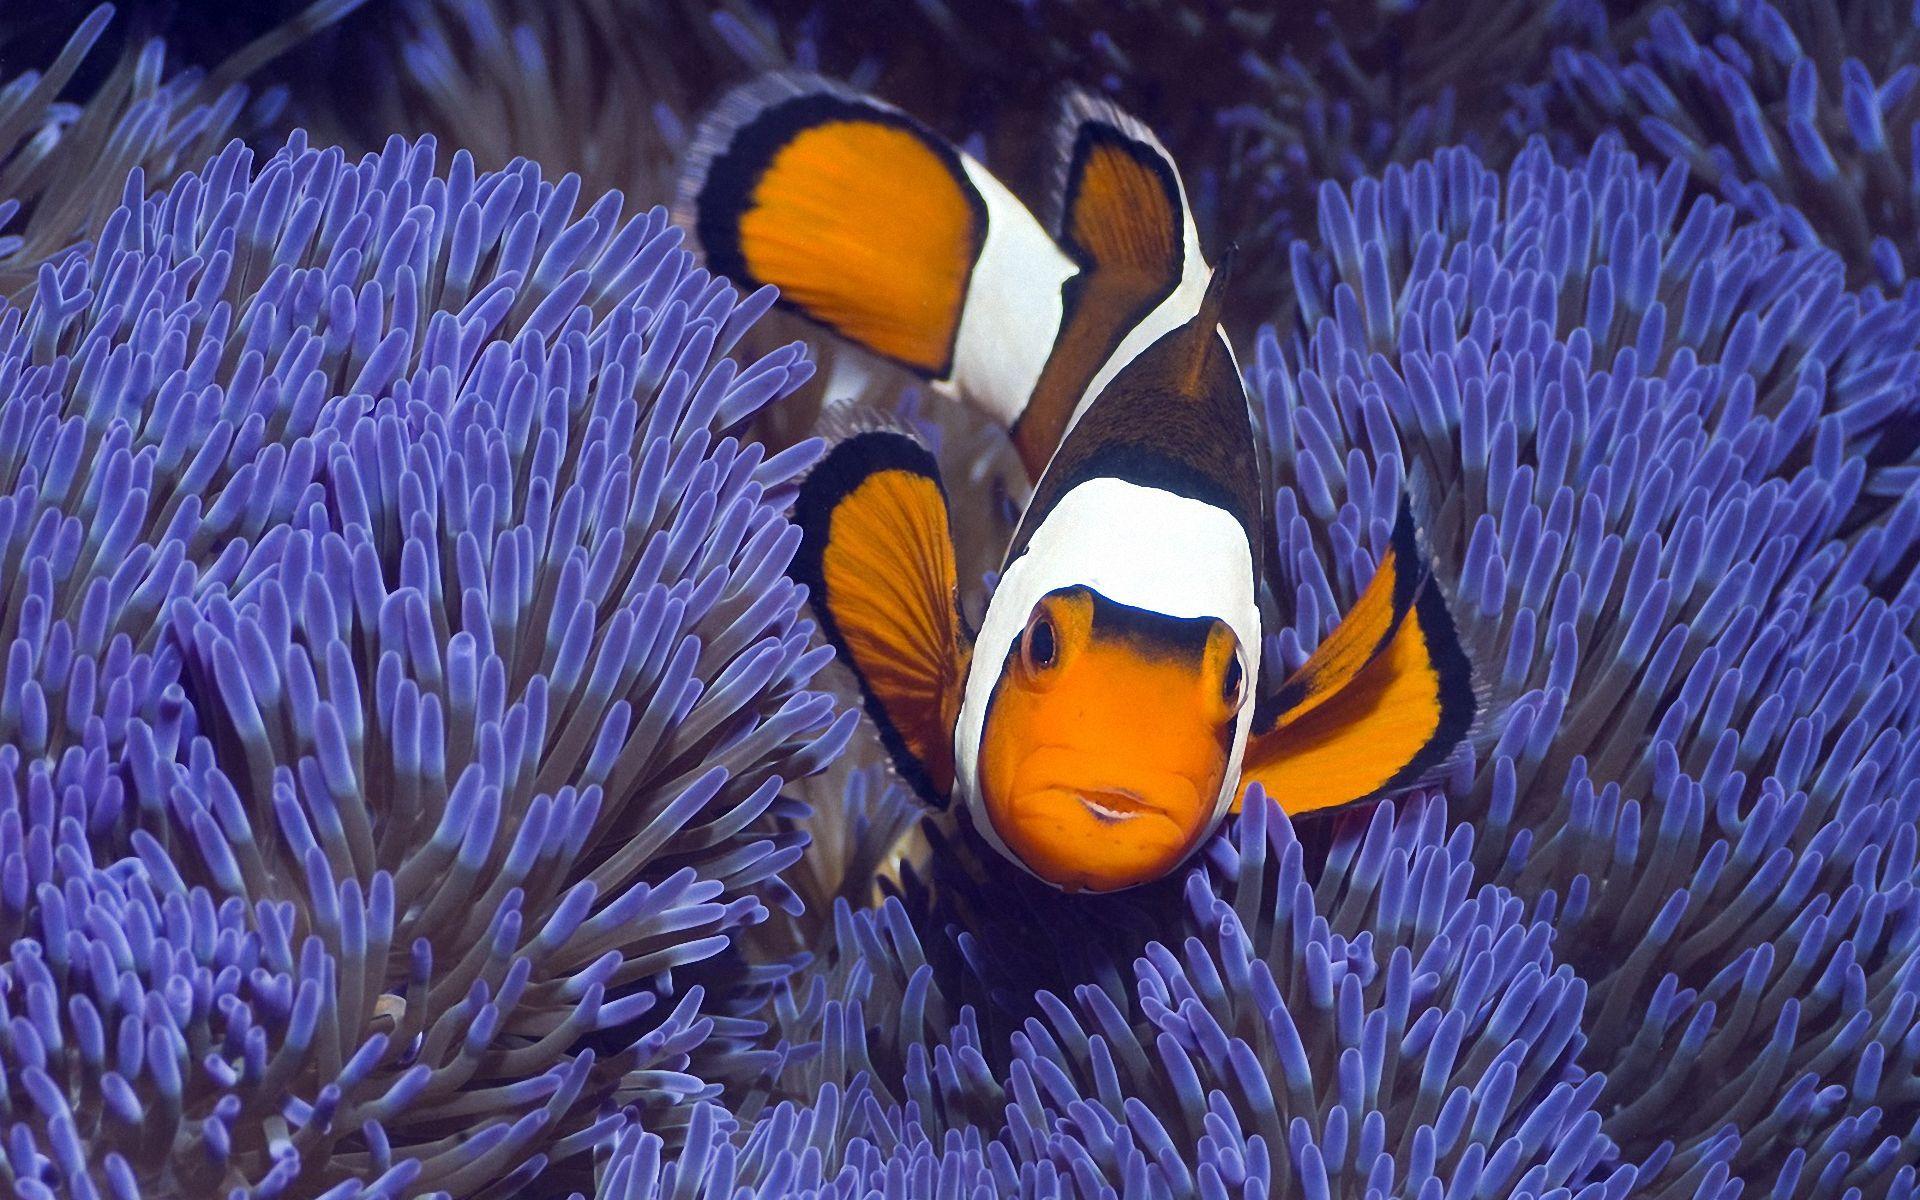 Tropical Fish Wallpaper 149363 1920x1200 Jpg 1920 1200 Fish Wallpaper Clown Fish Tropical Fish